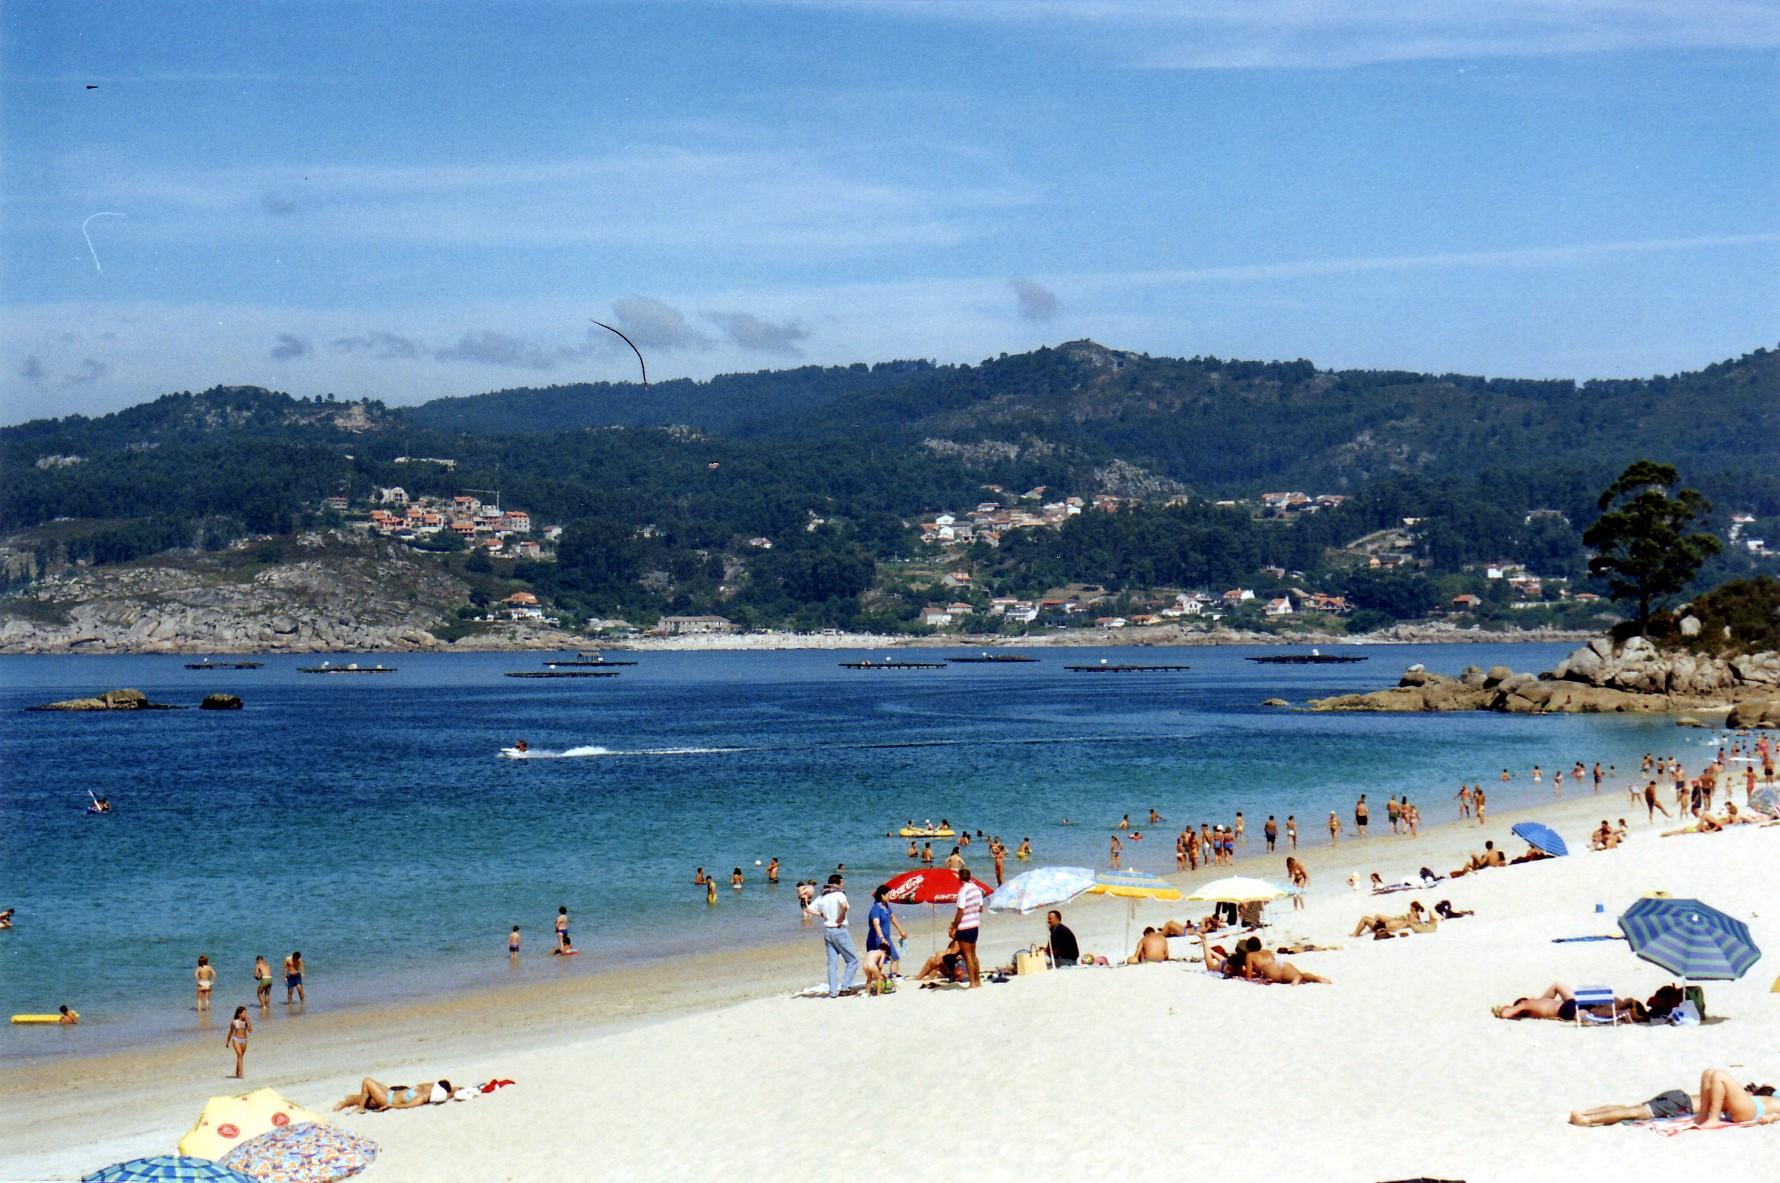 Foto playa Area Brava / Os Alemáns / Alemanes. Playa de Area Brava, Vilanova